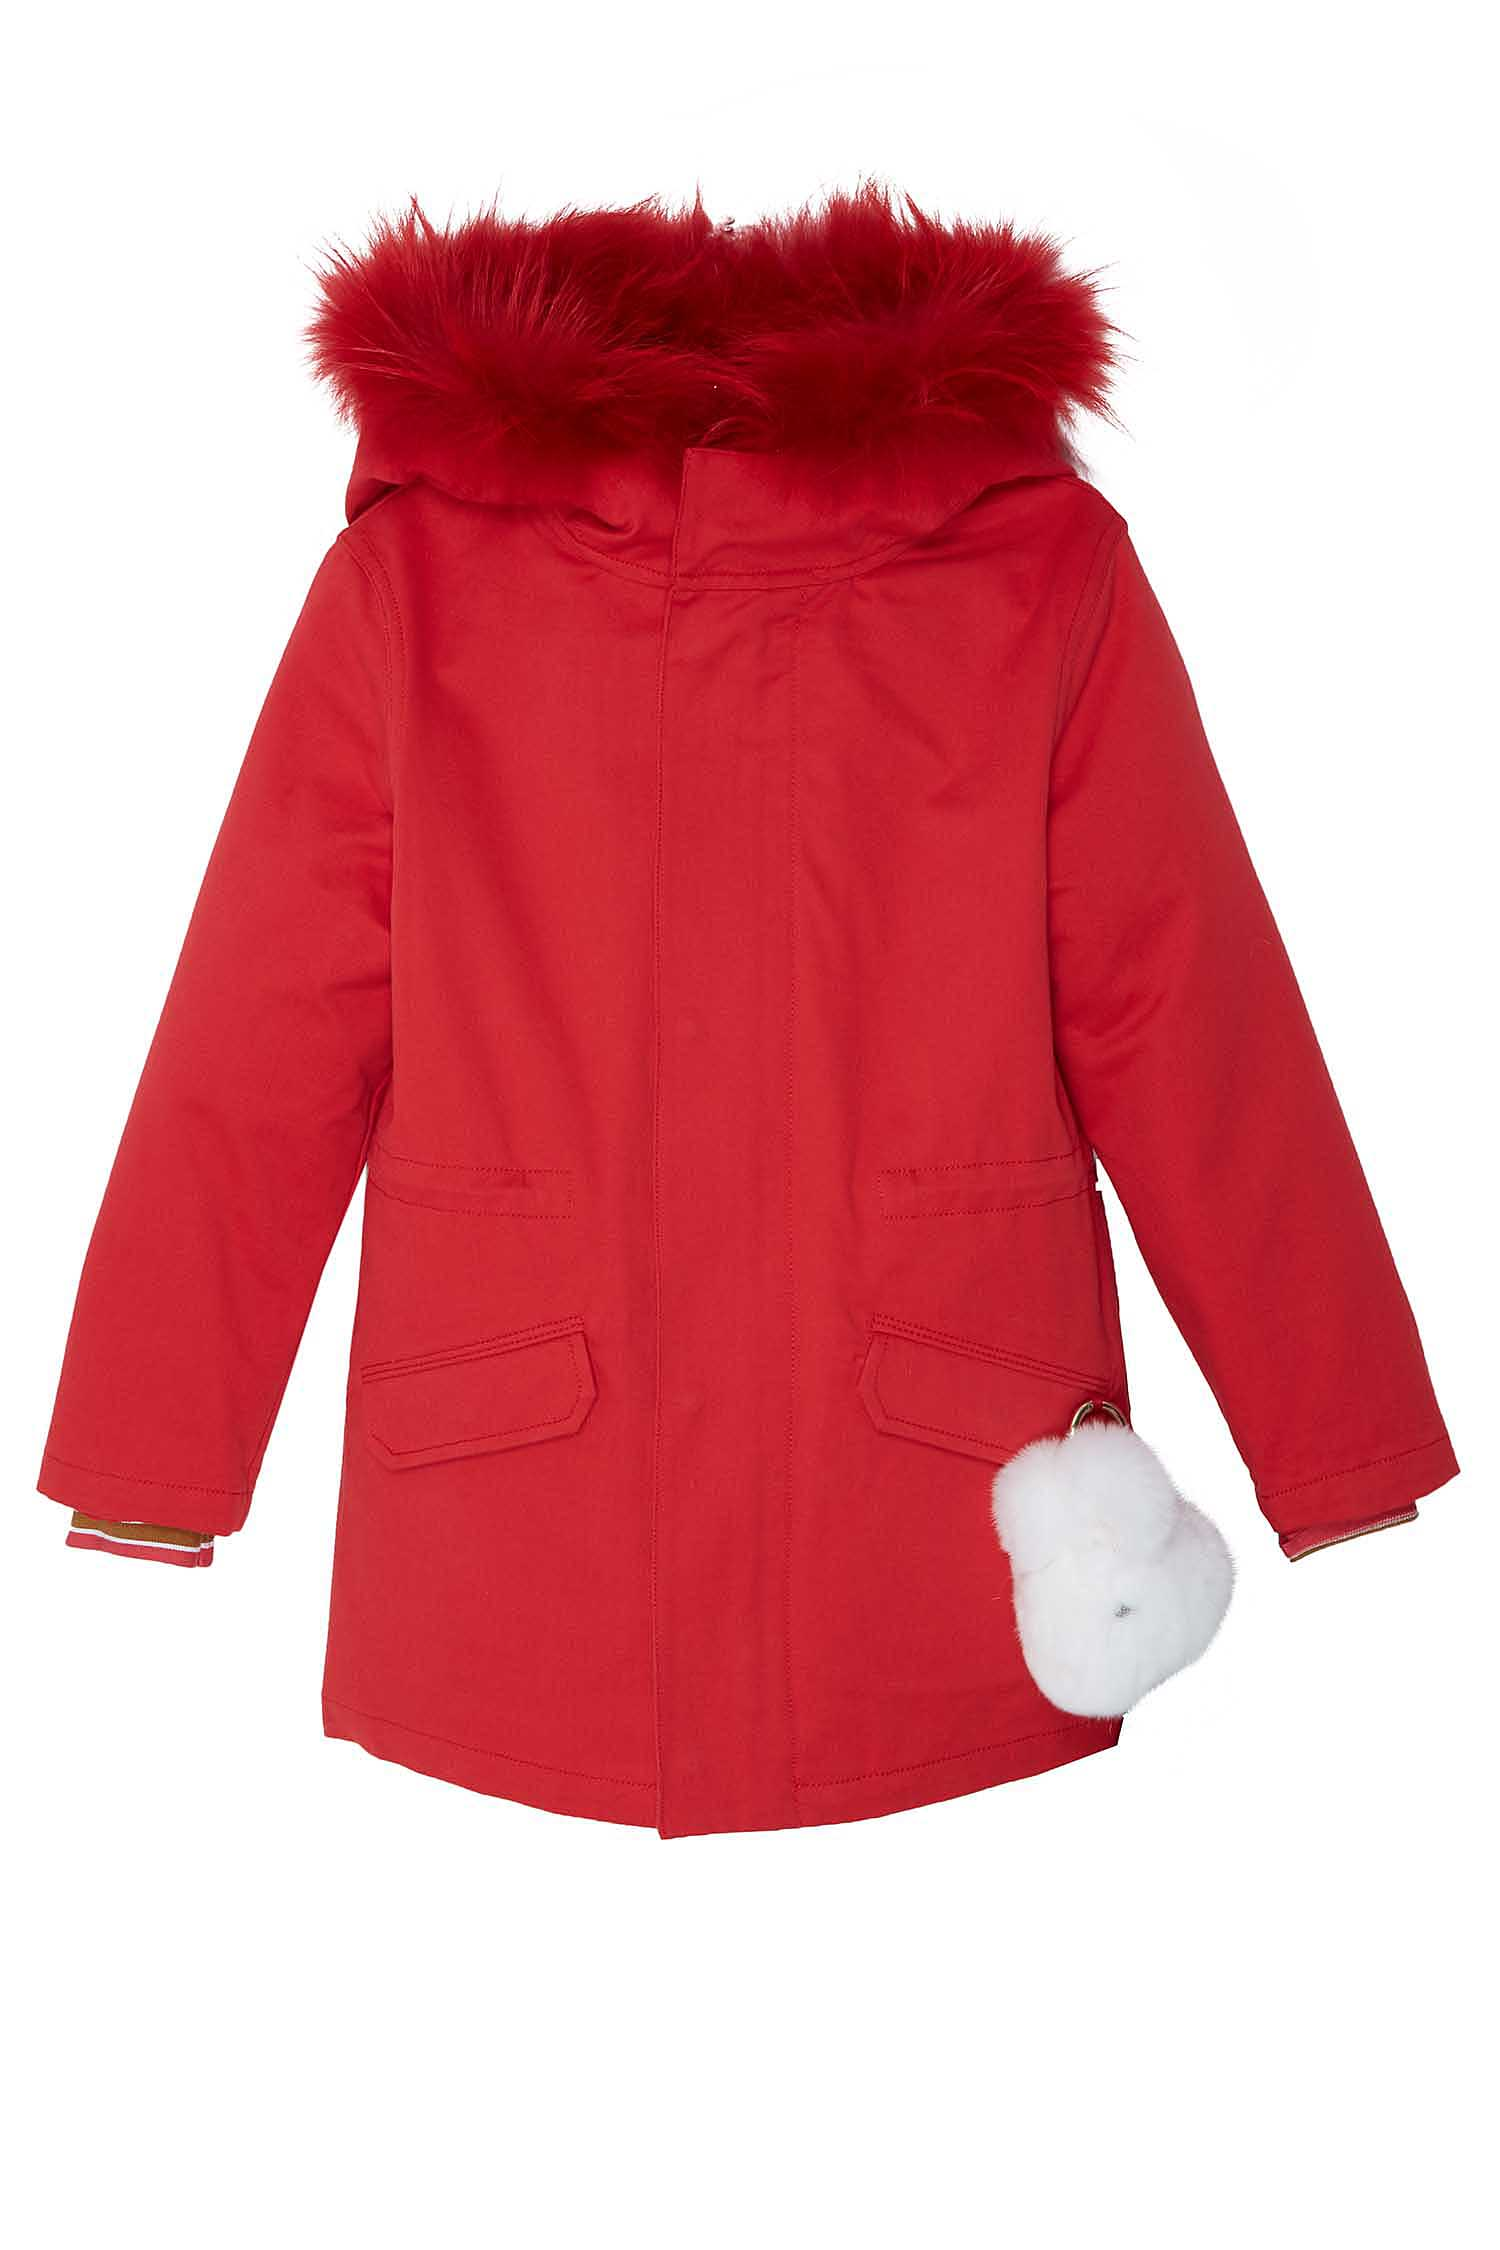 Красная куртка с мехом Yves Salomon Kids - Теплая куртка ярко ... 1136ad8cf08